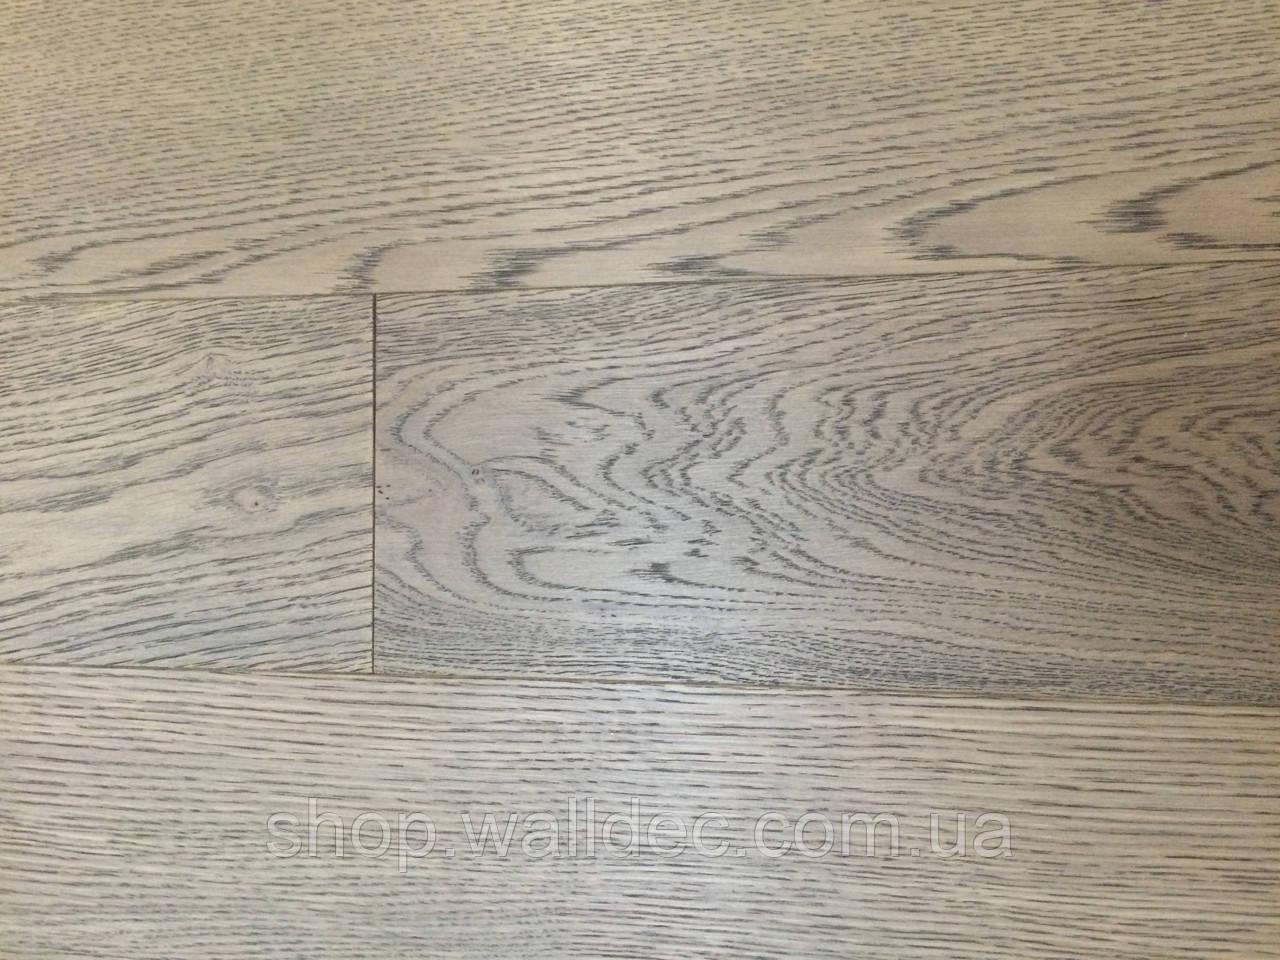 Паркетная доска из дуба Oak HARDY  120/140мм